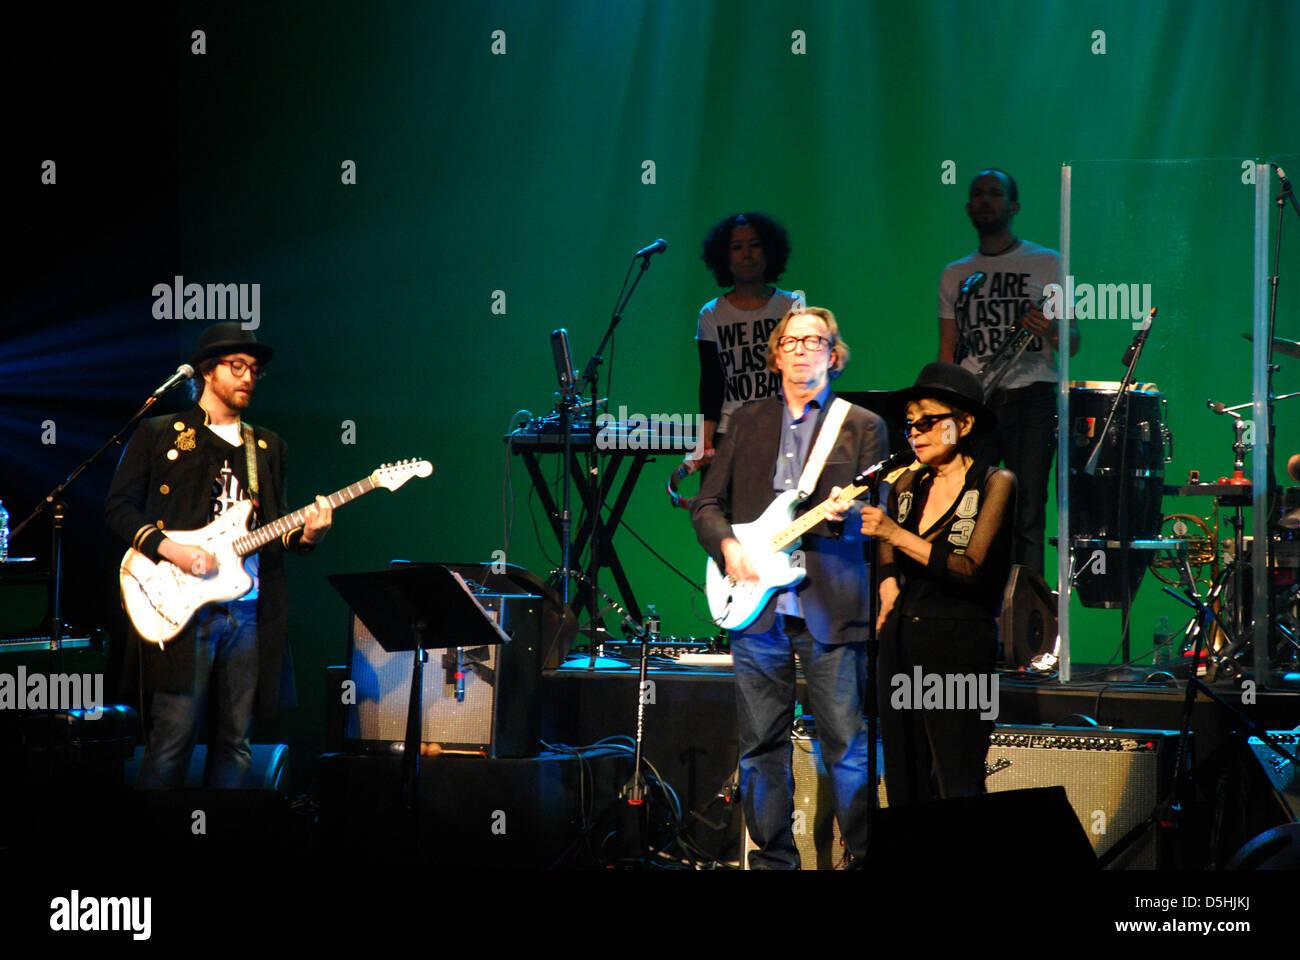 Sean Lennon (L-R), Eric Clapton, Yoko Ono, viuda de John Lennon, realice con la banda 'Ono' de plástico Imagen De Stock